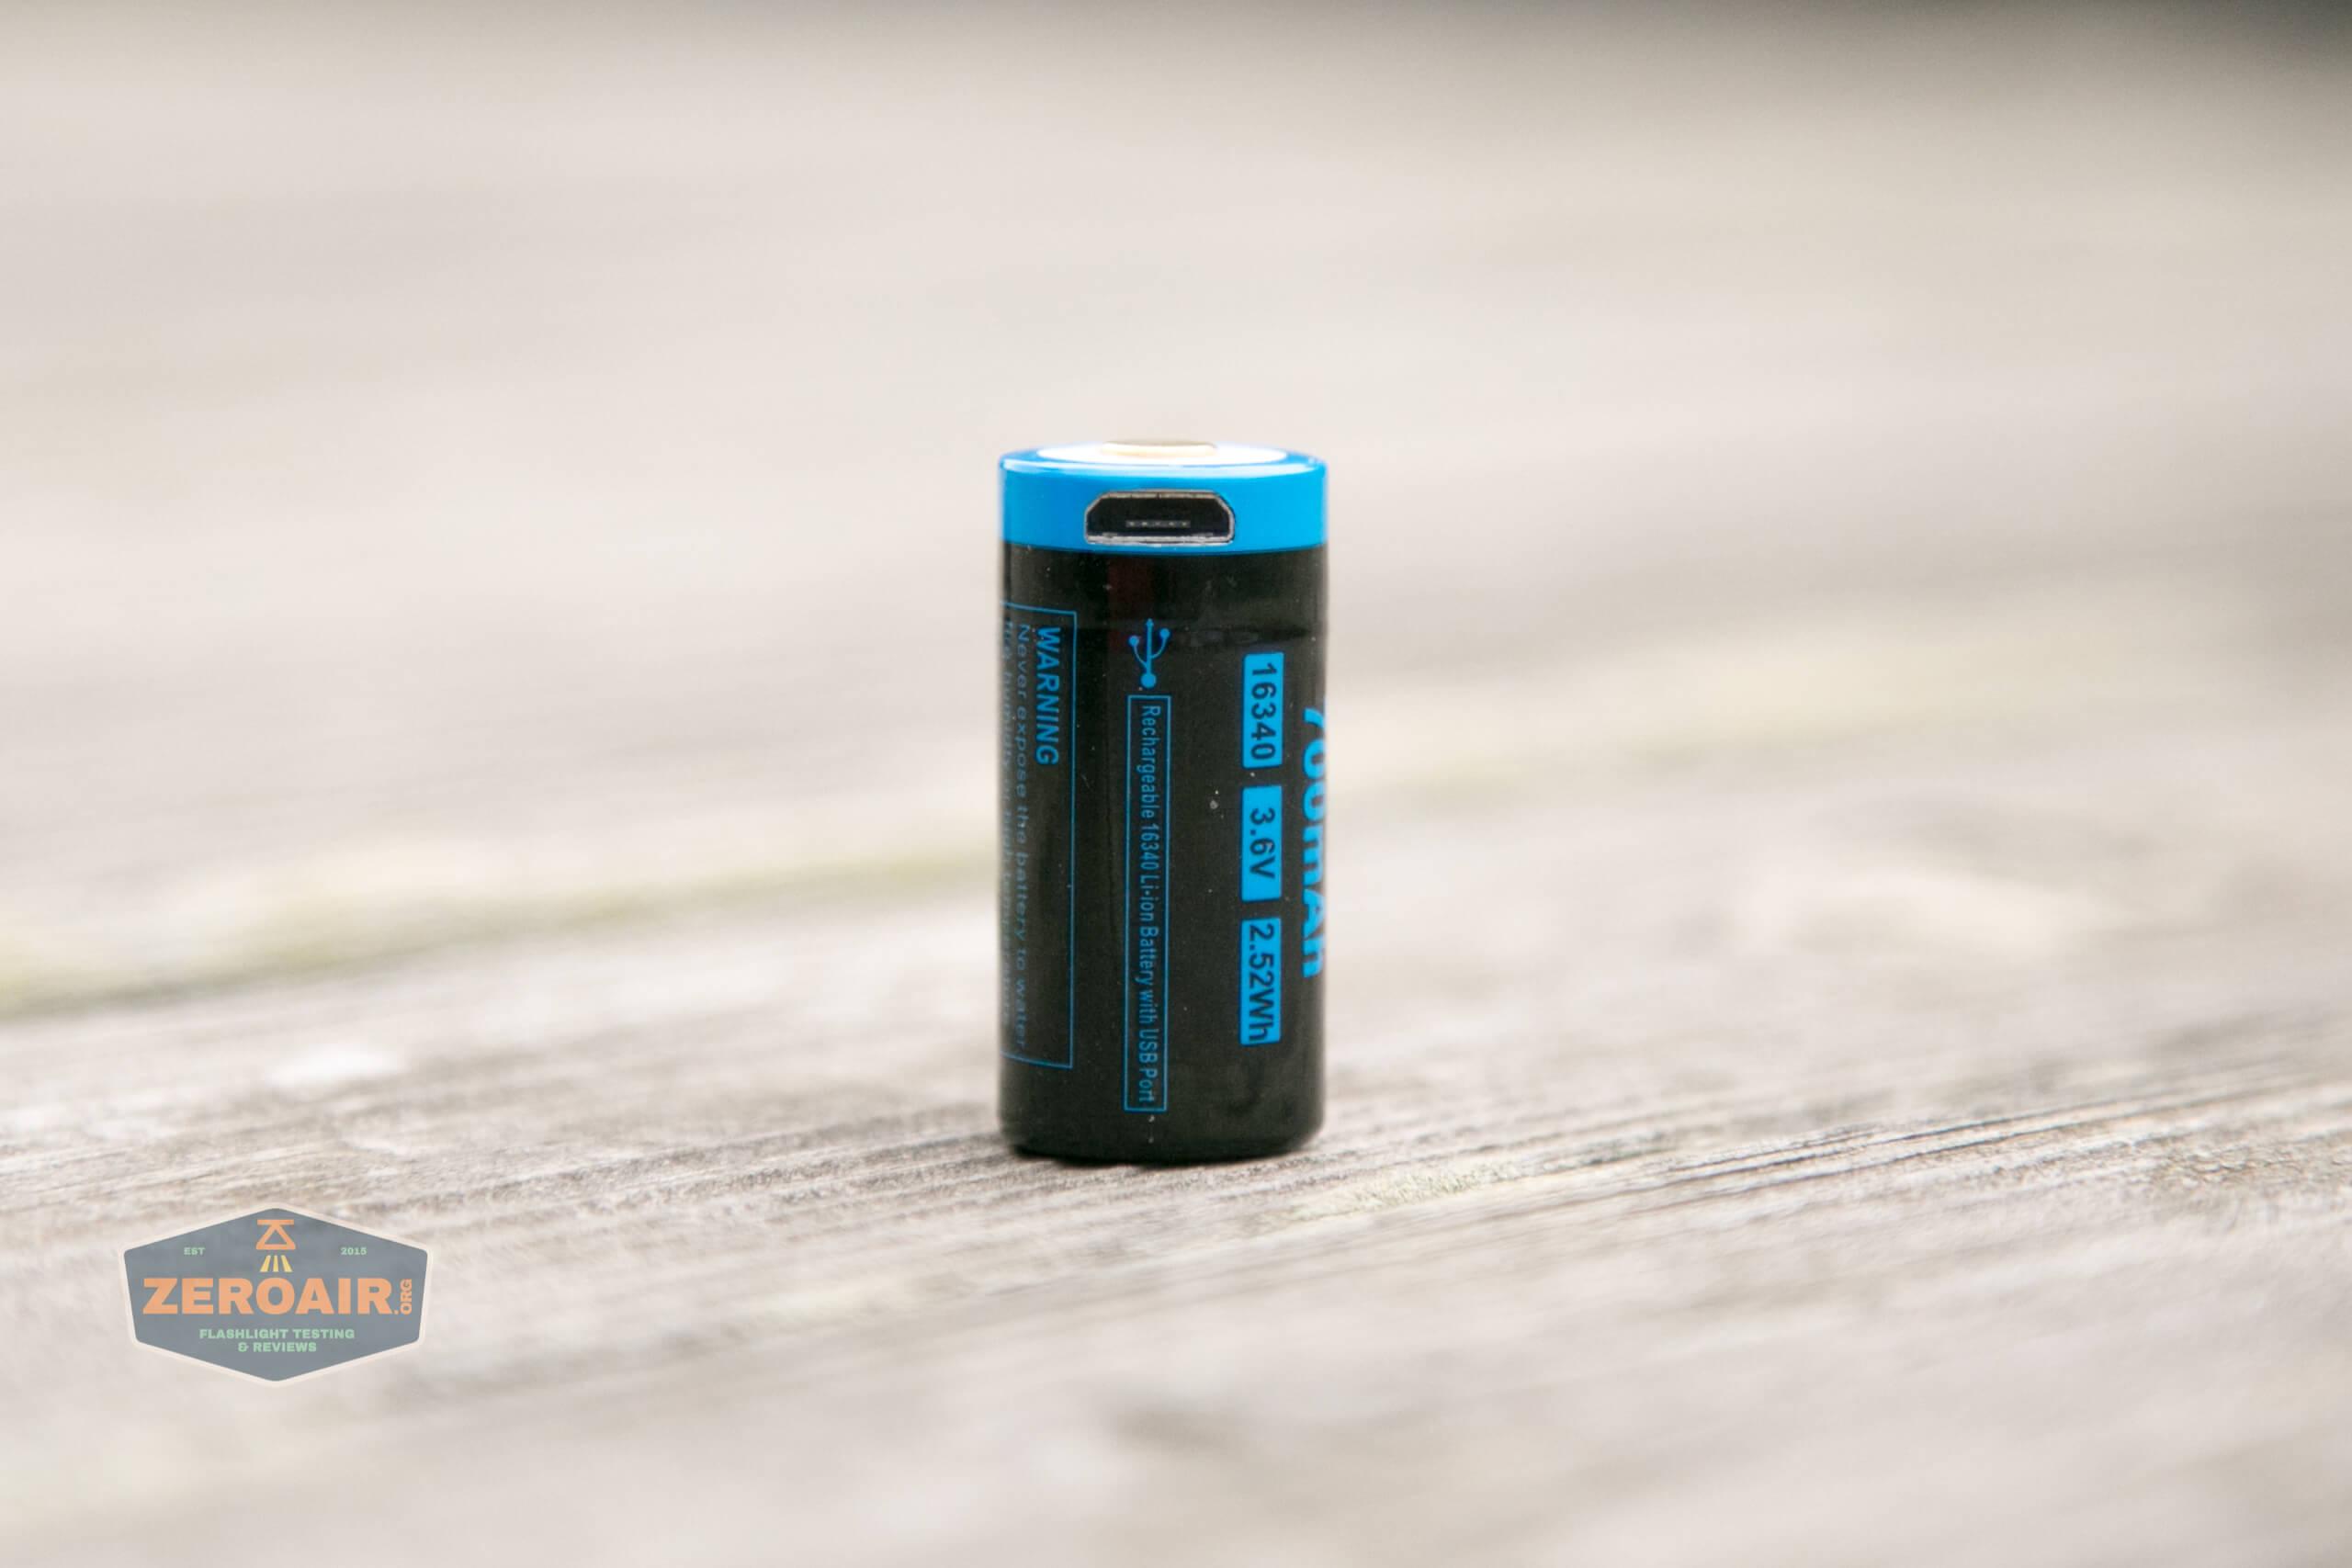 freasygears cyansky m3 titanium pocket flashlight included 16340